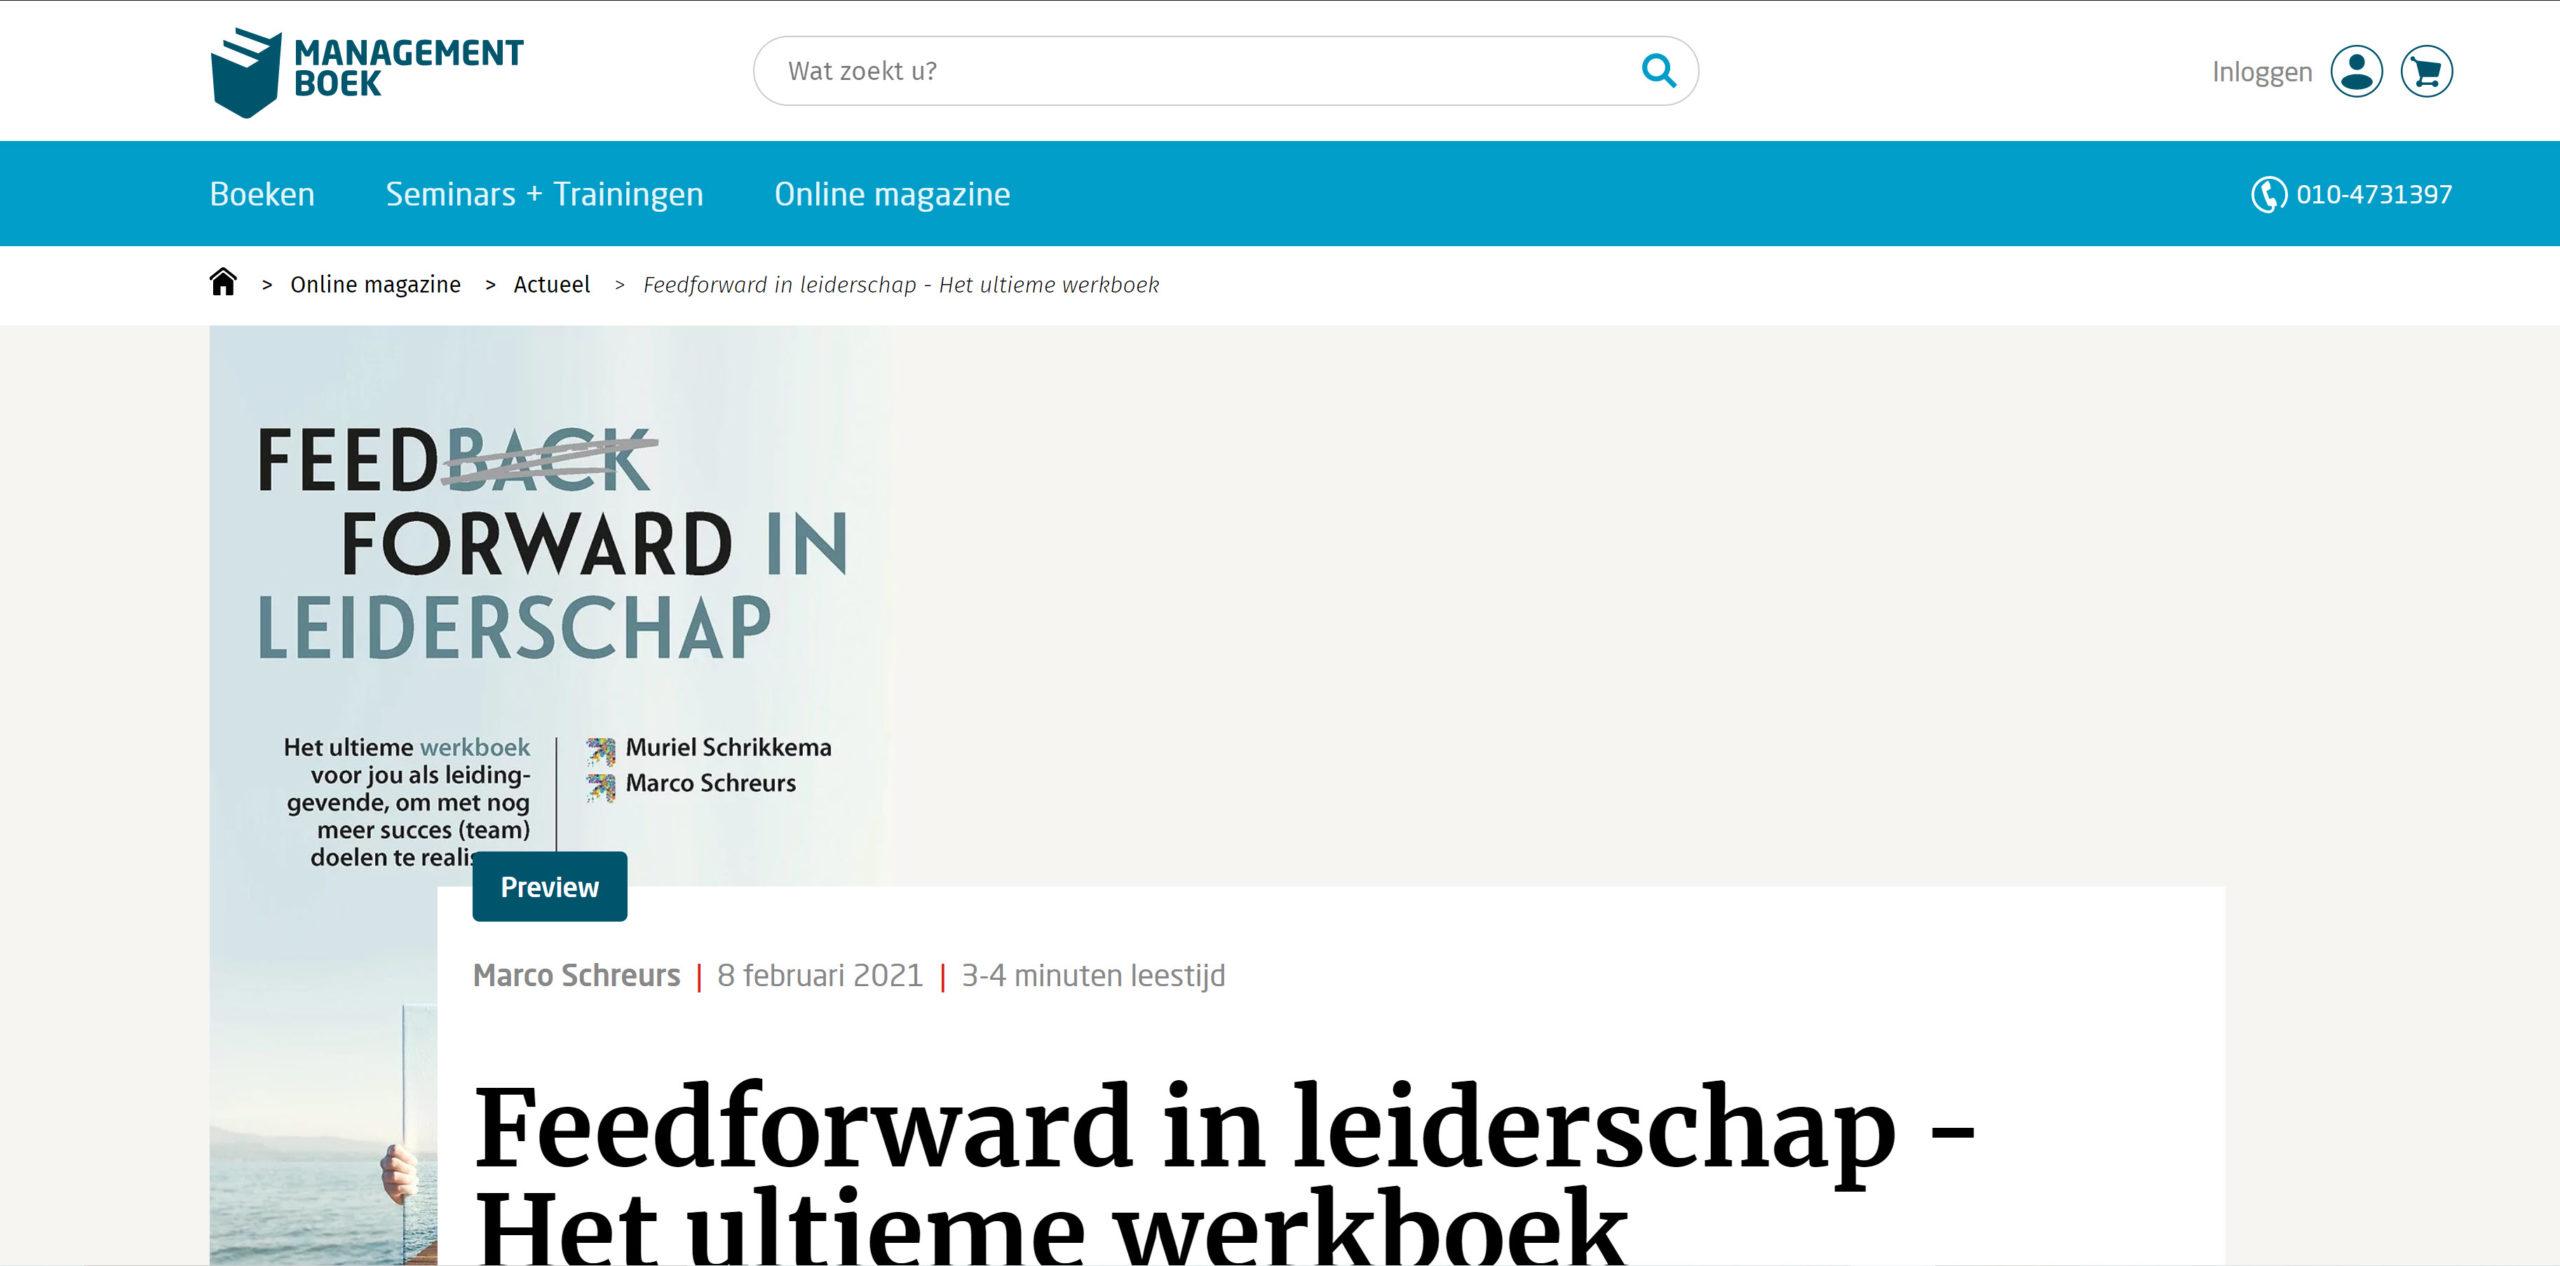 preview-Feedforward-in-Leiderschap-1